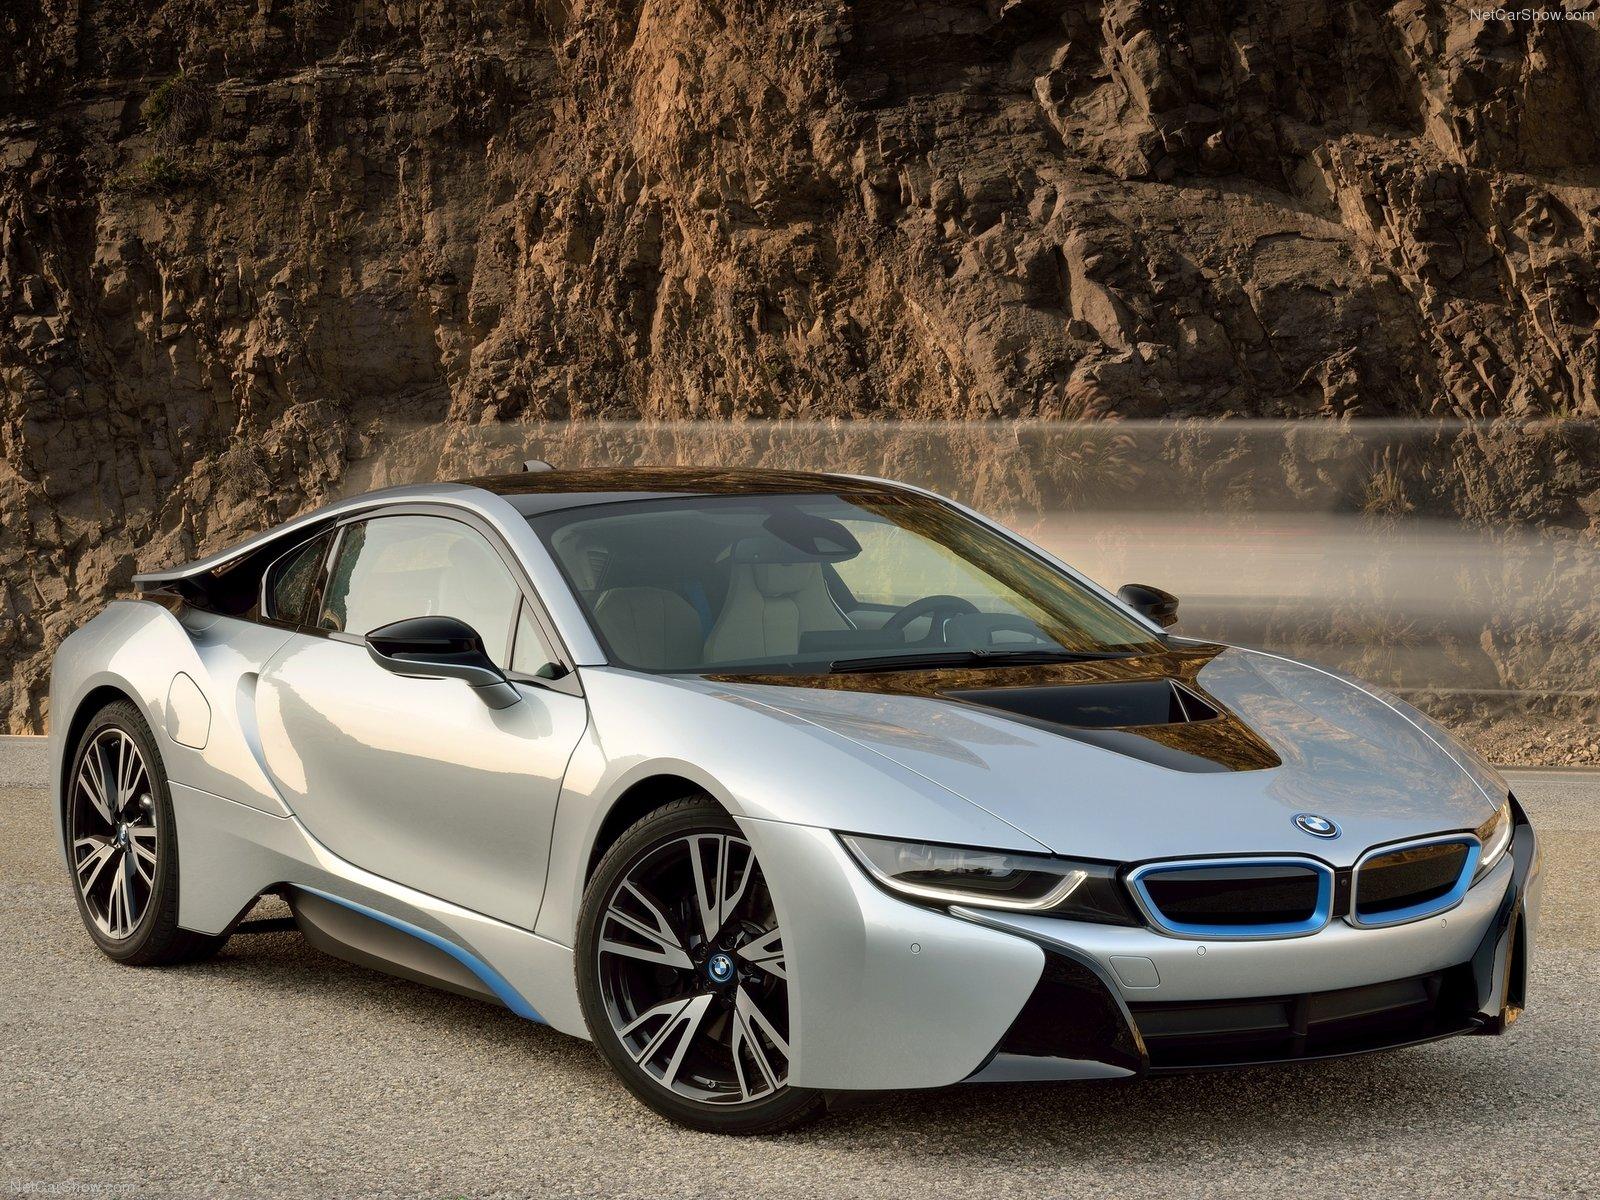 Worksheet. 3DTuning of BMW i8 series Coupe 2014 3DTuningcom  unique online